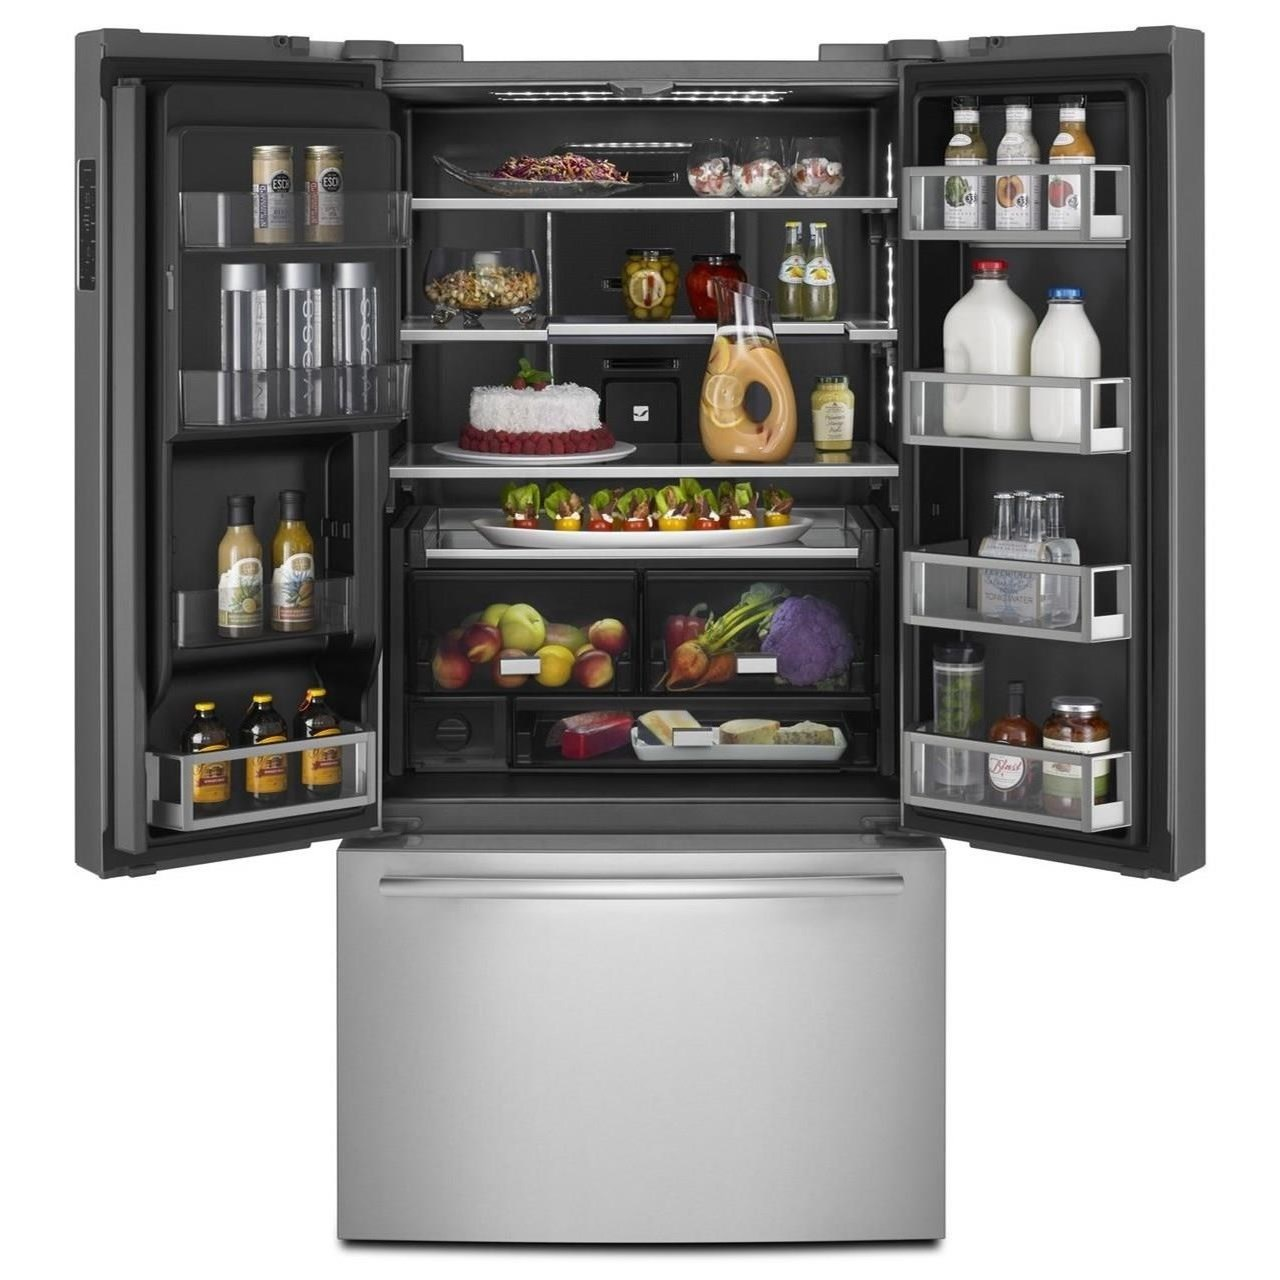 Jenn air jffcc72efs72 counter depth french door for Obsidian interior refrigerator